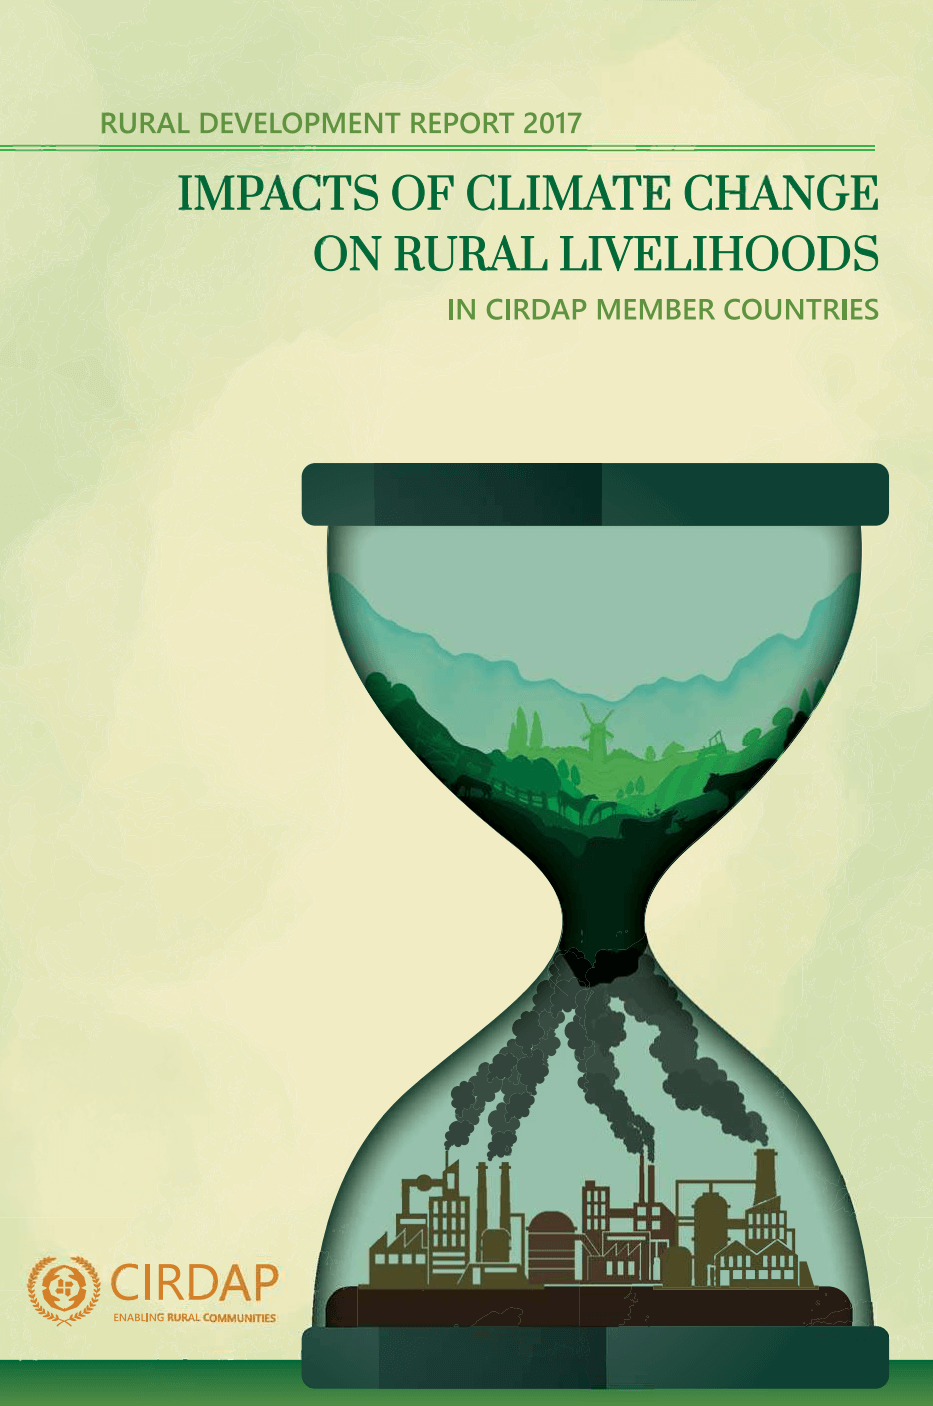 Rural-Development-Report-2017_001